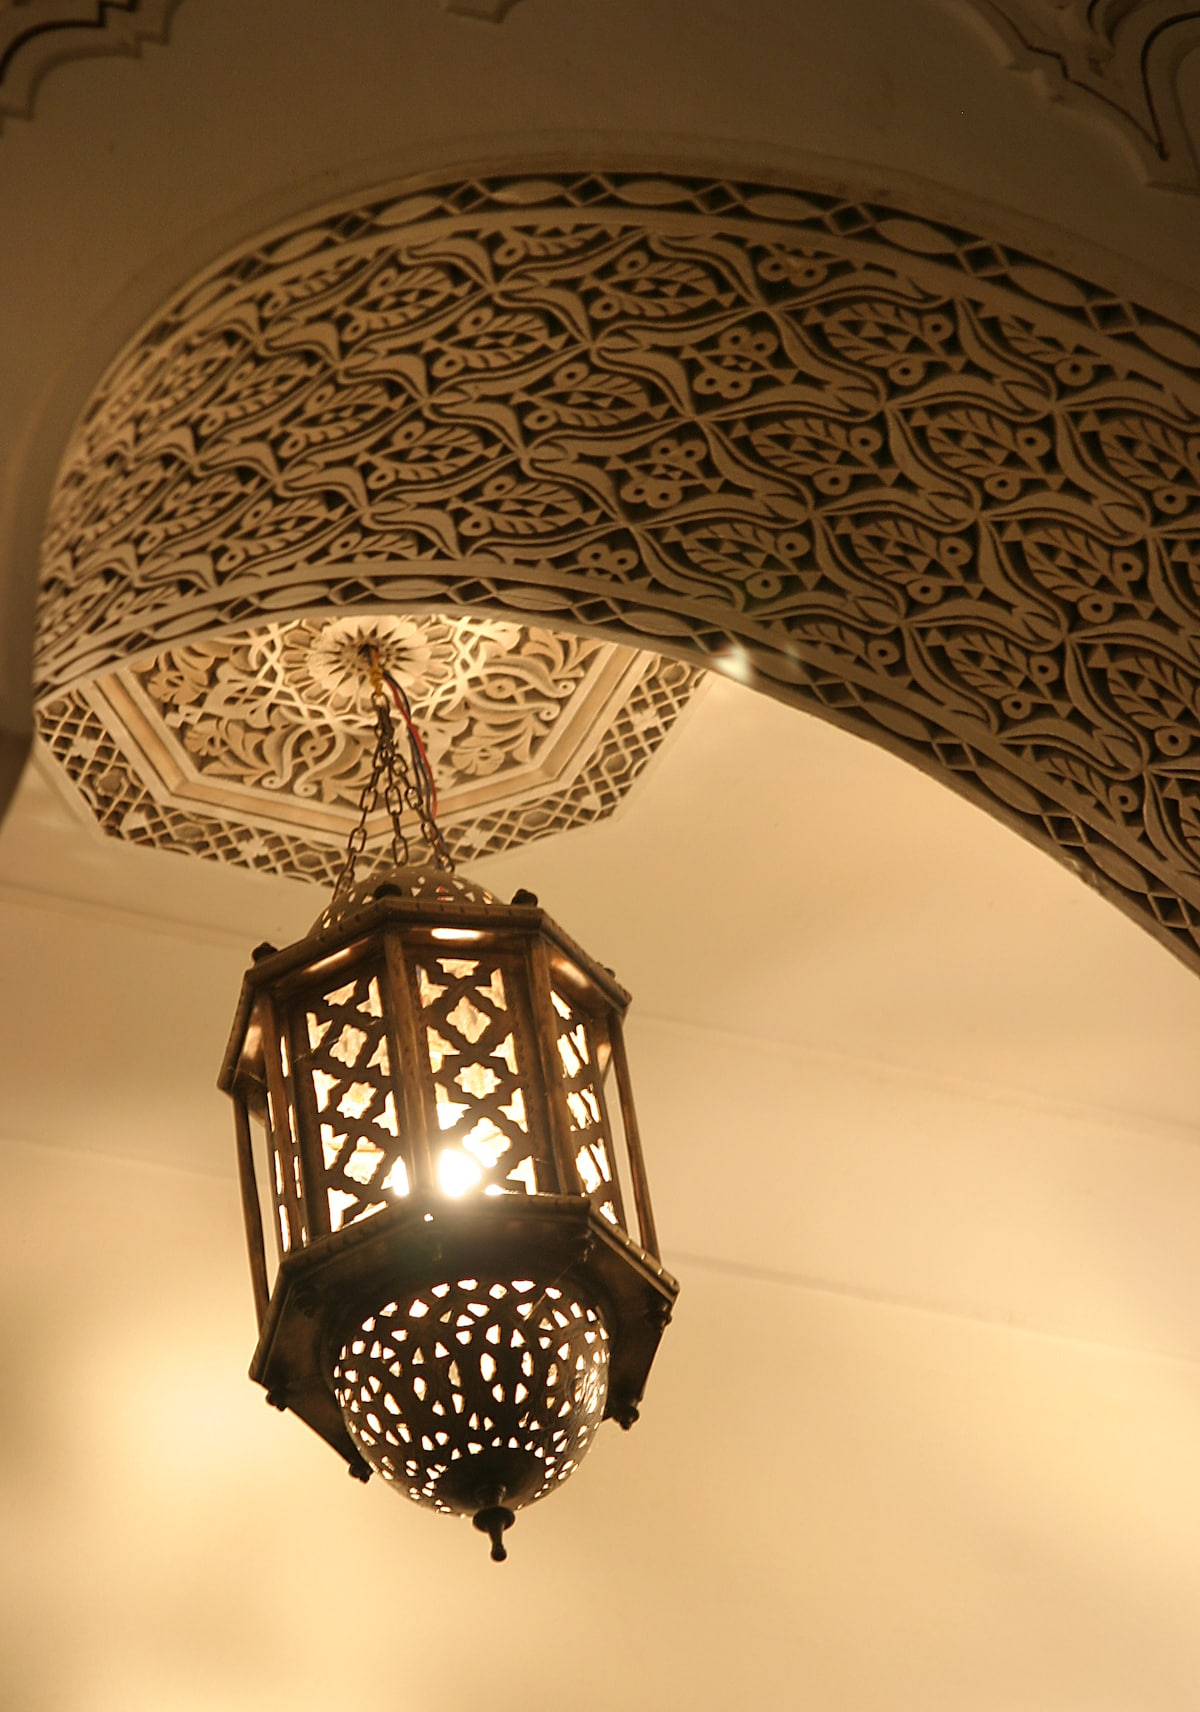 lantern above the room's Zahia entrance